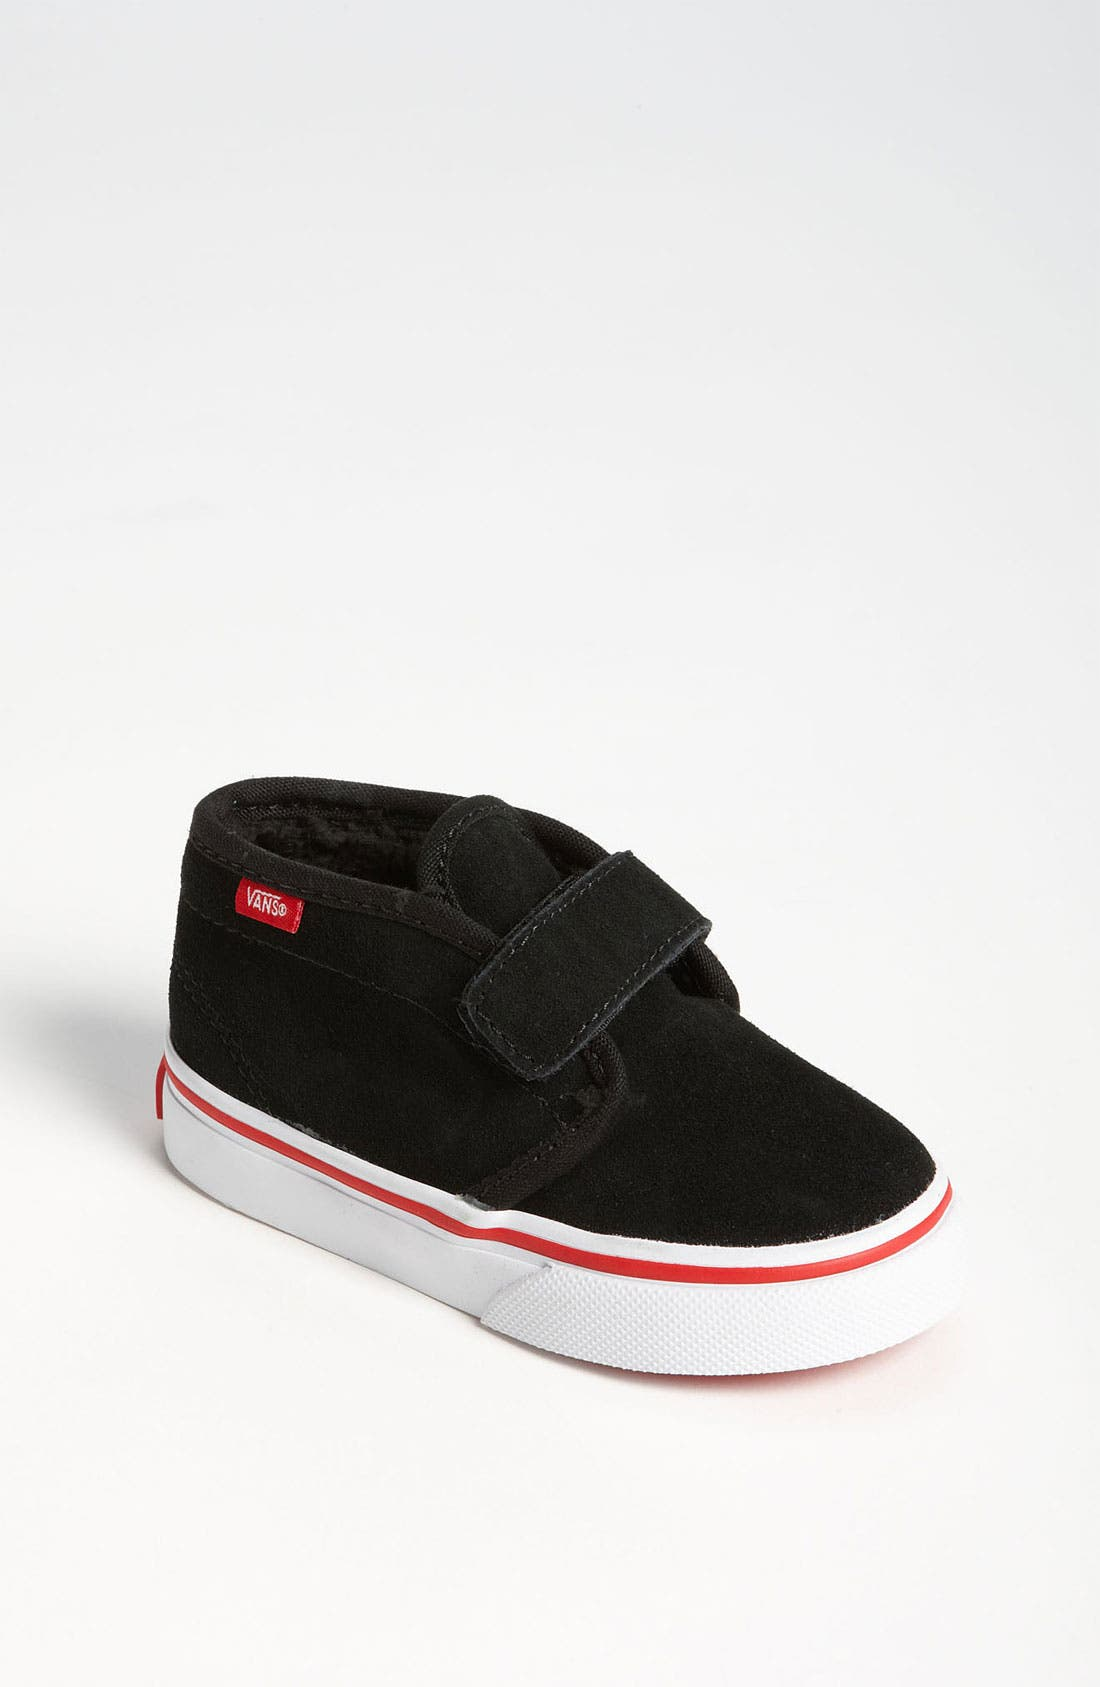 Alternate Image 1 Selected - Vans Chukka Boot (Baby, Walker & Toddler)